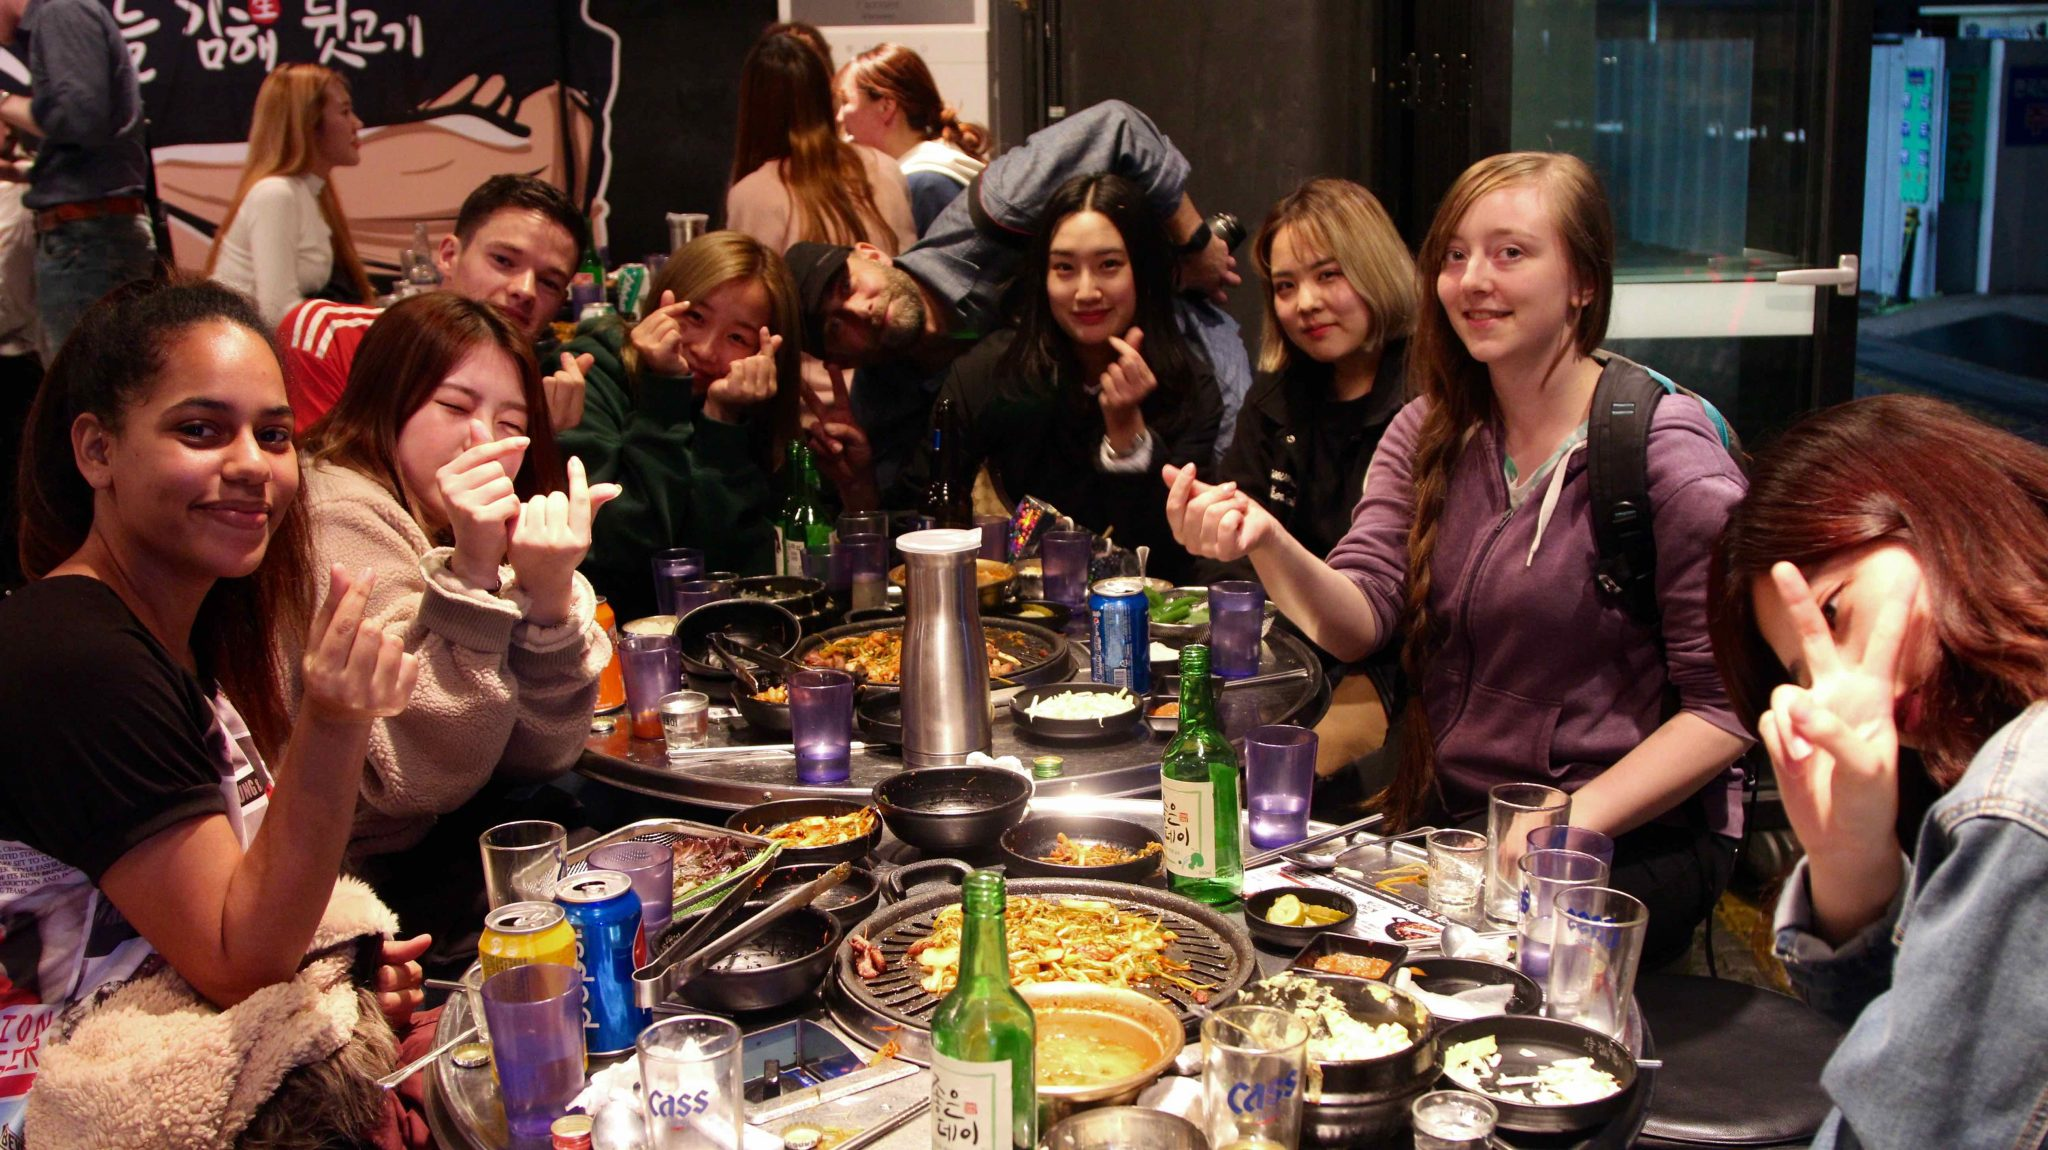 Student eating together